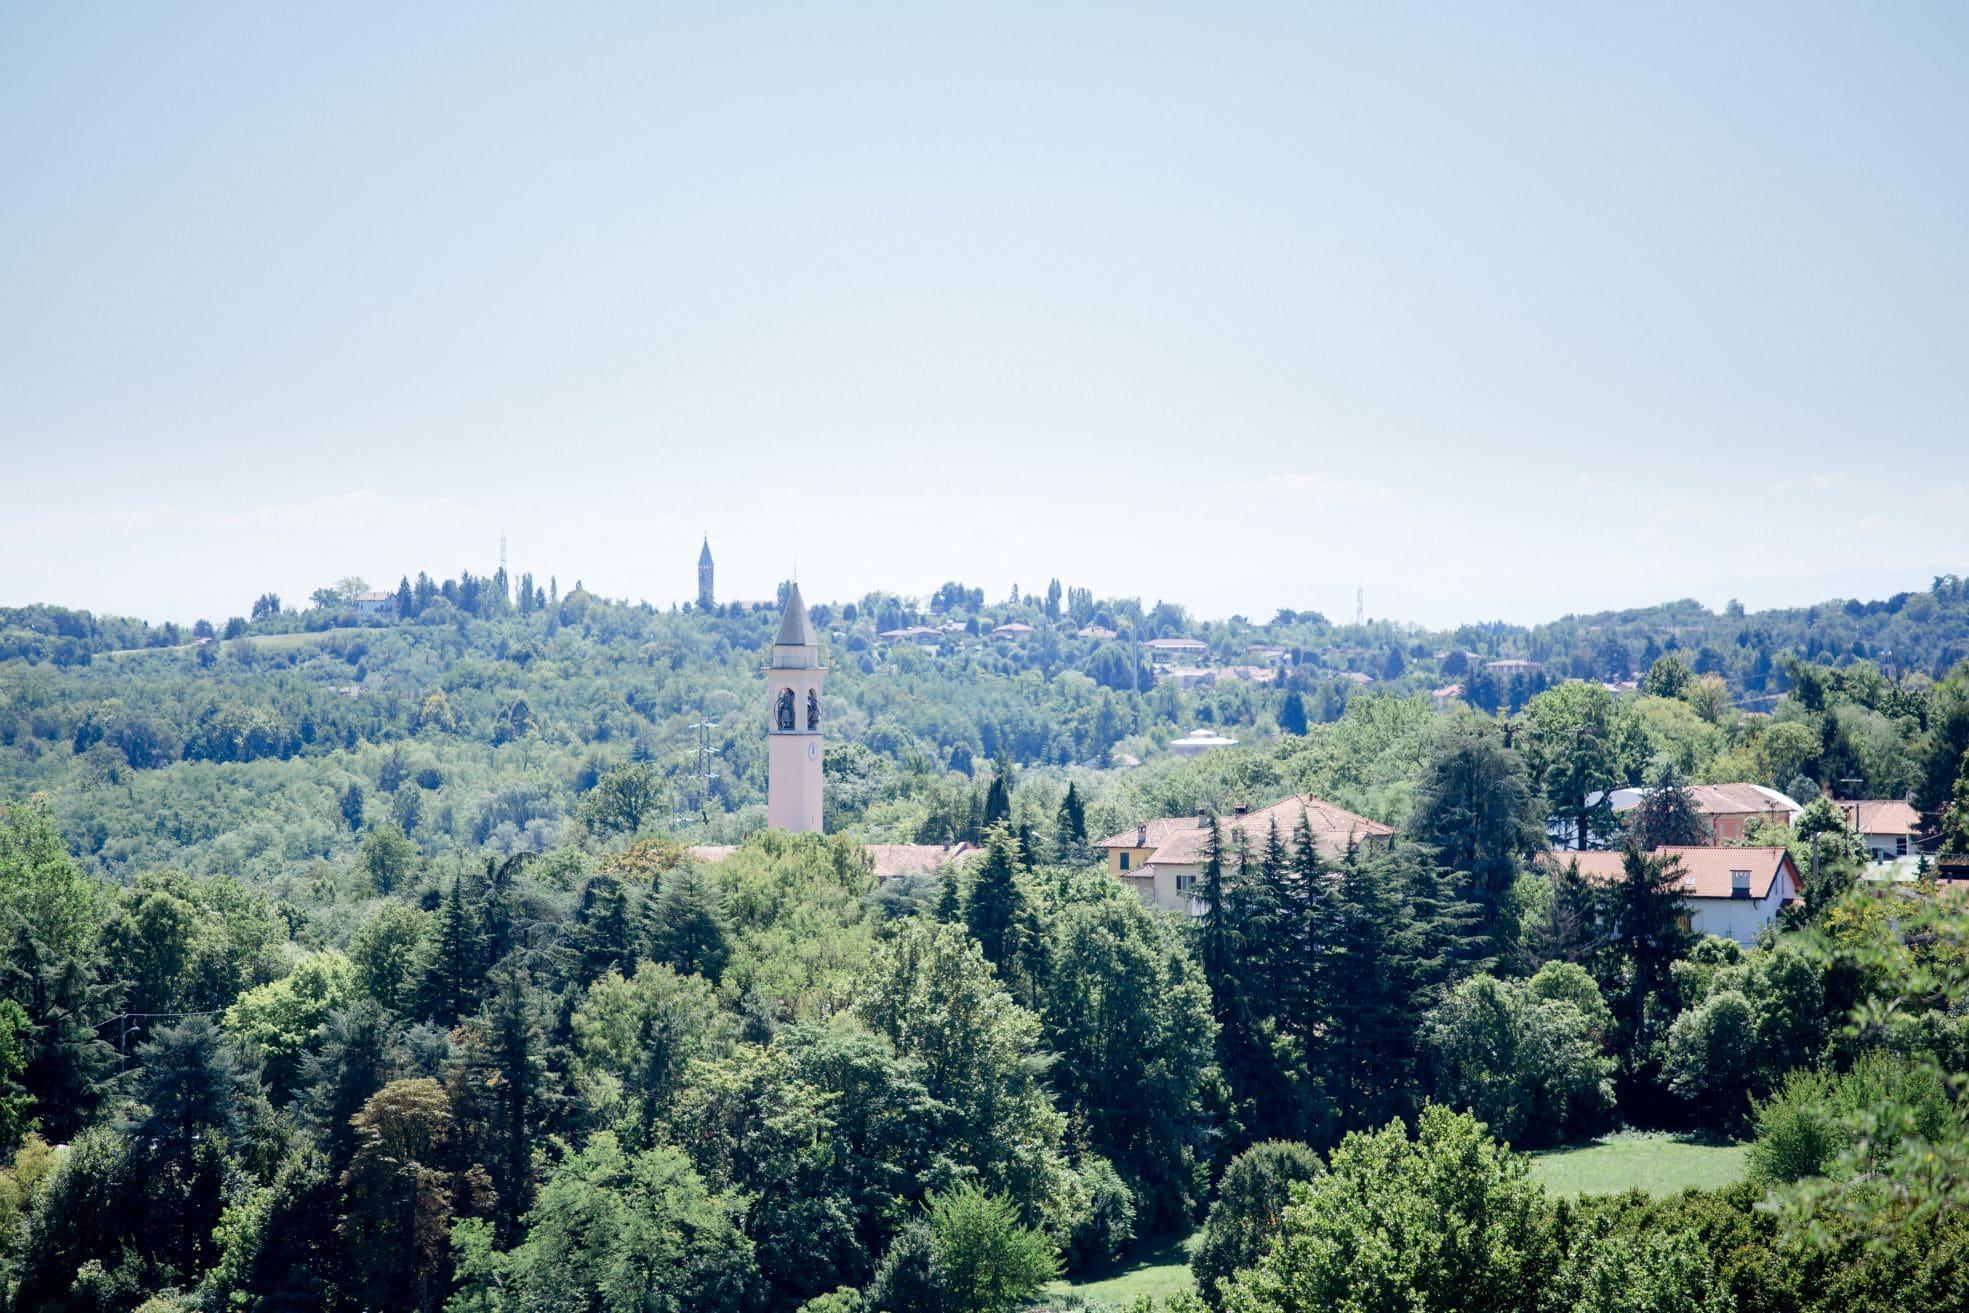 Million Memories_A&D_Hochzeitsfotograf_Schlosshochzeit_Toskana_Lago Di Como_Wedding_Tuscany_063